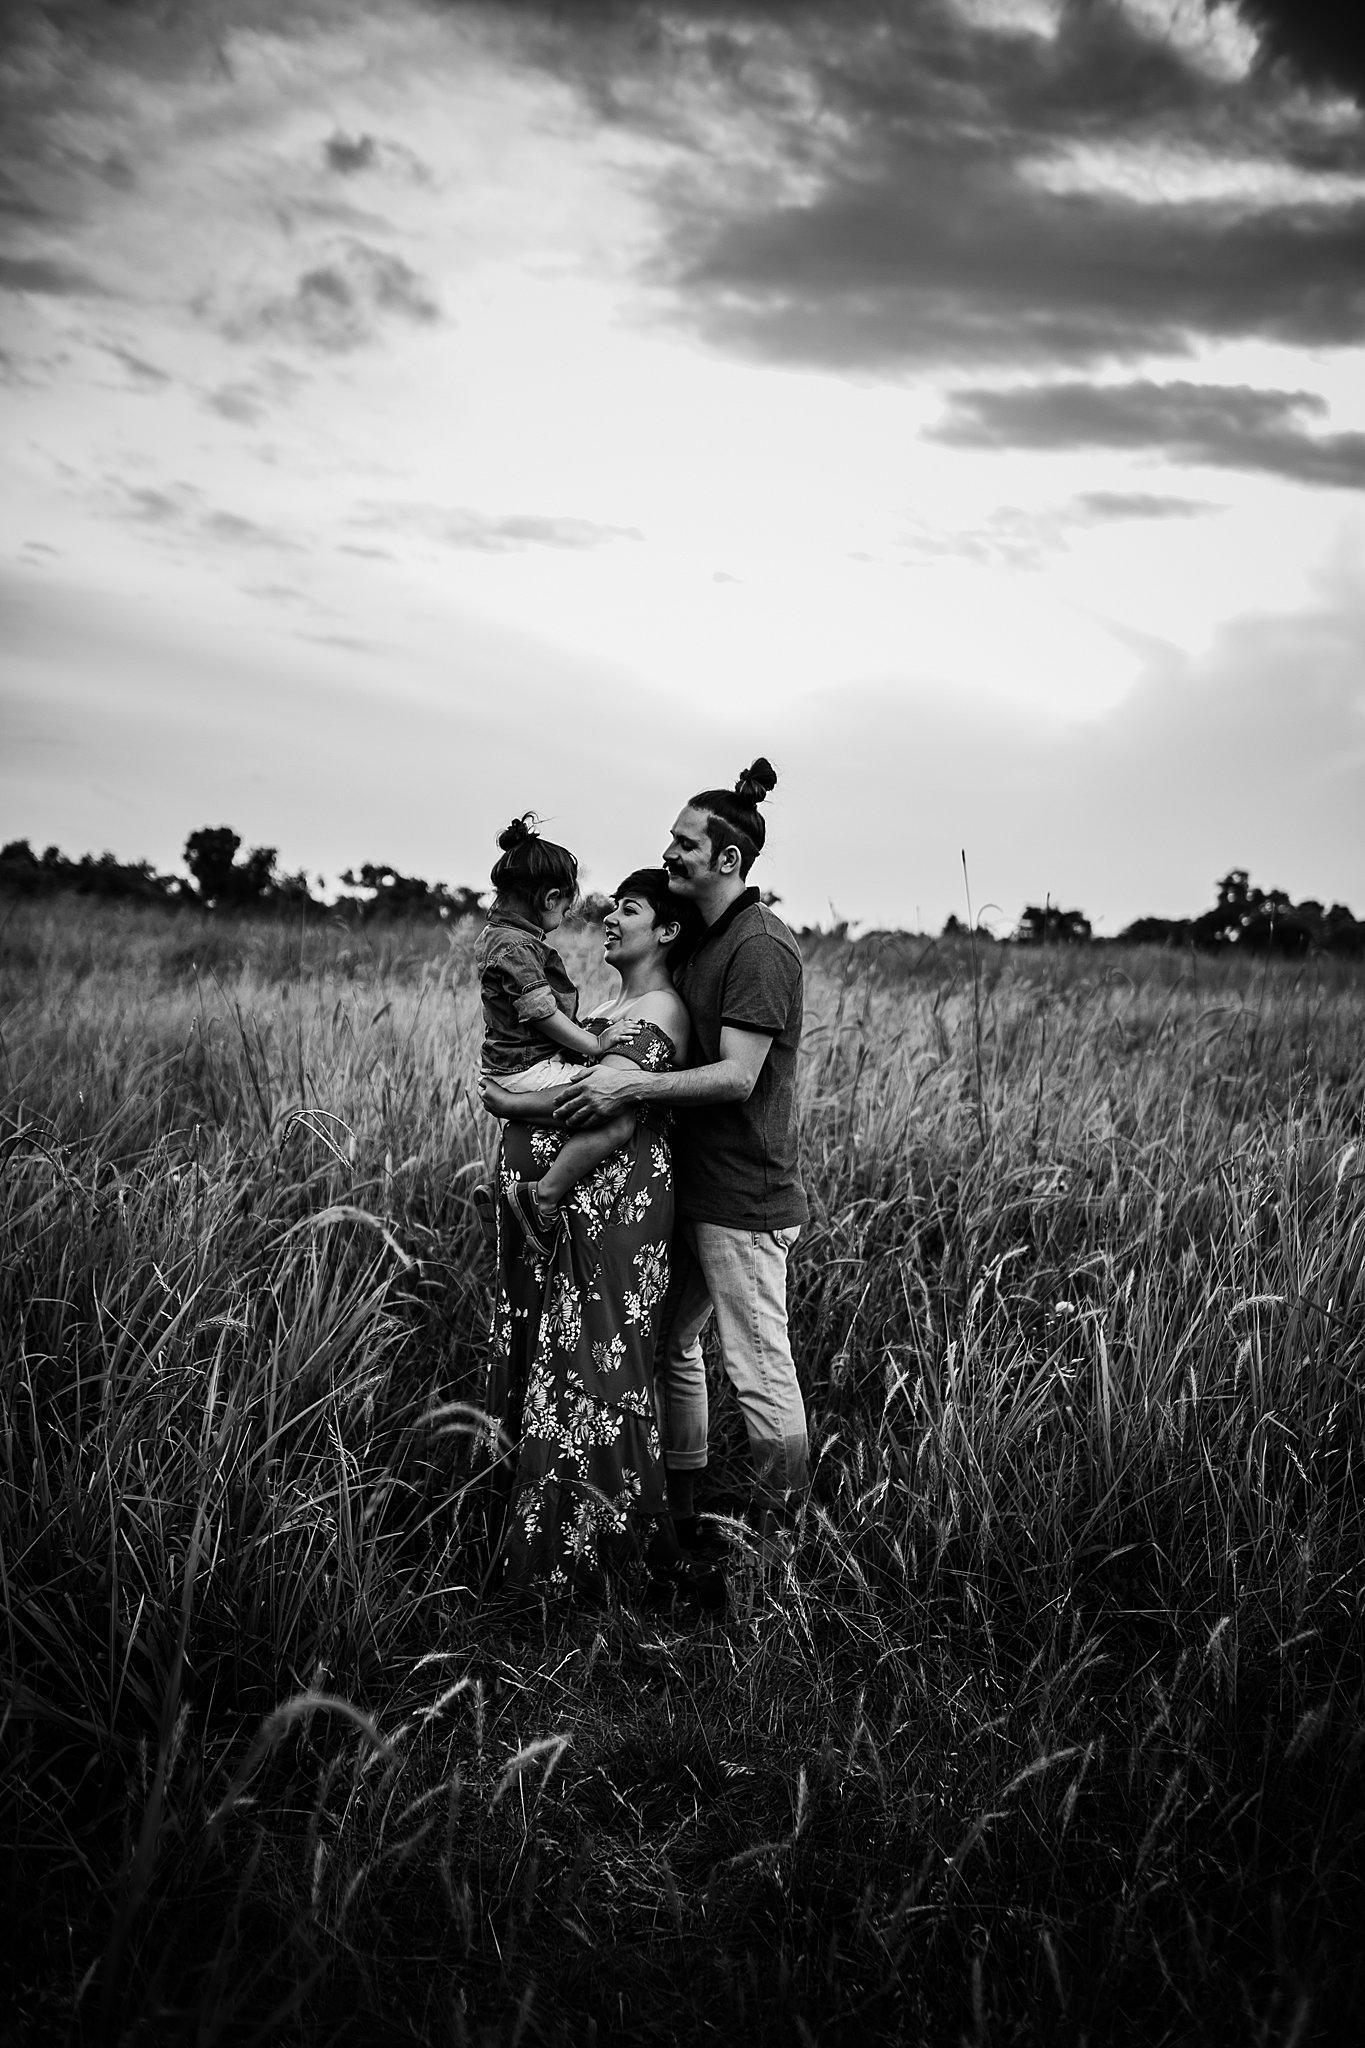 Meagan-San-Antonio-Maternity-Photographer-52_WEB.jpg